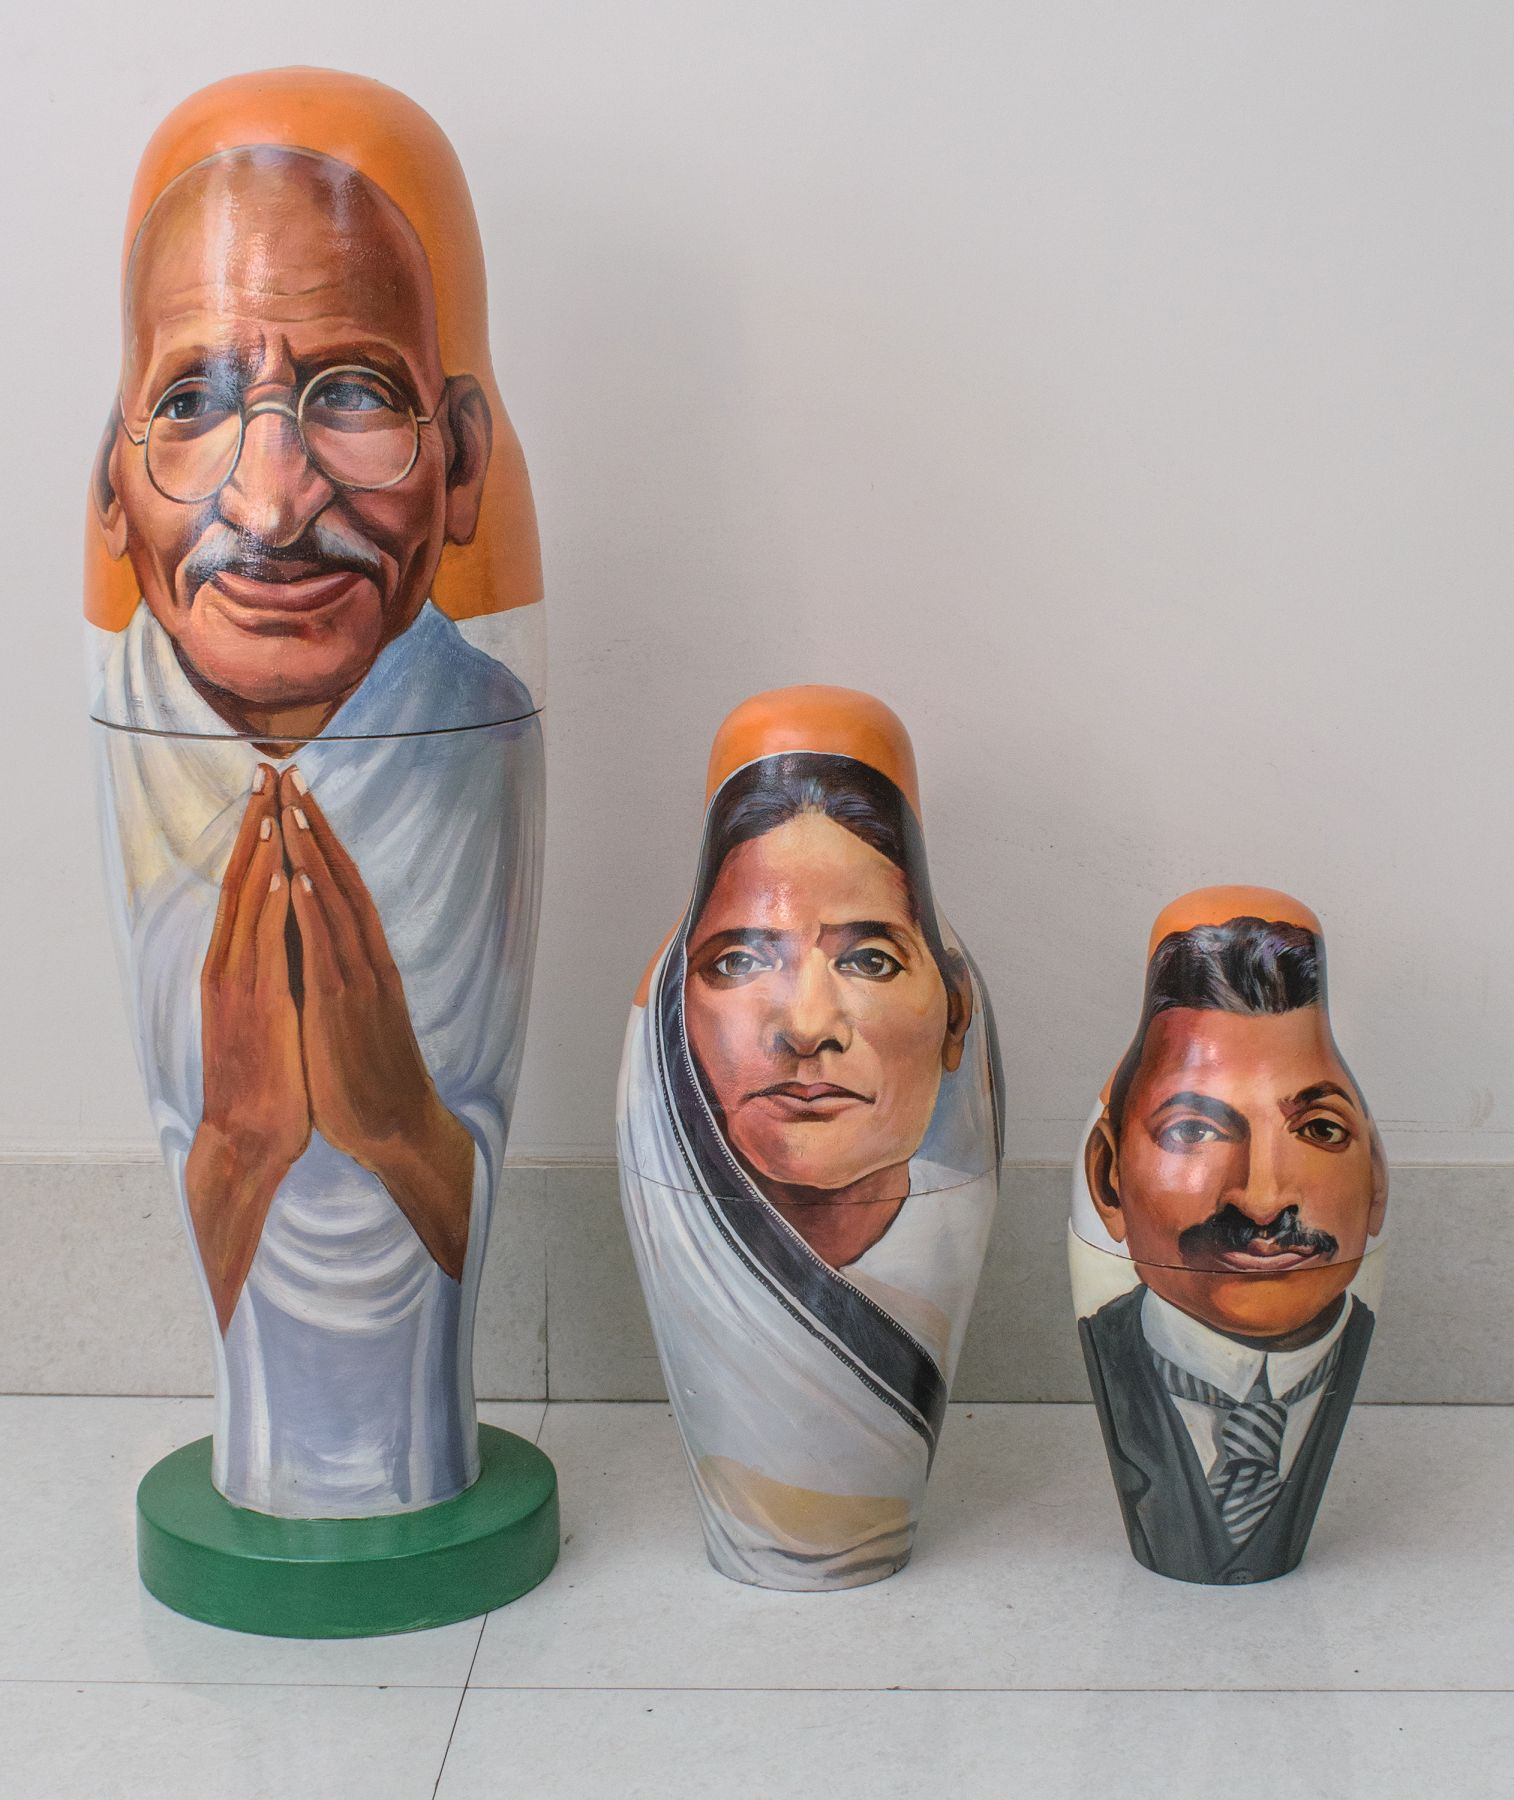 Toy Gandhi 2 (Russian Dolls)